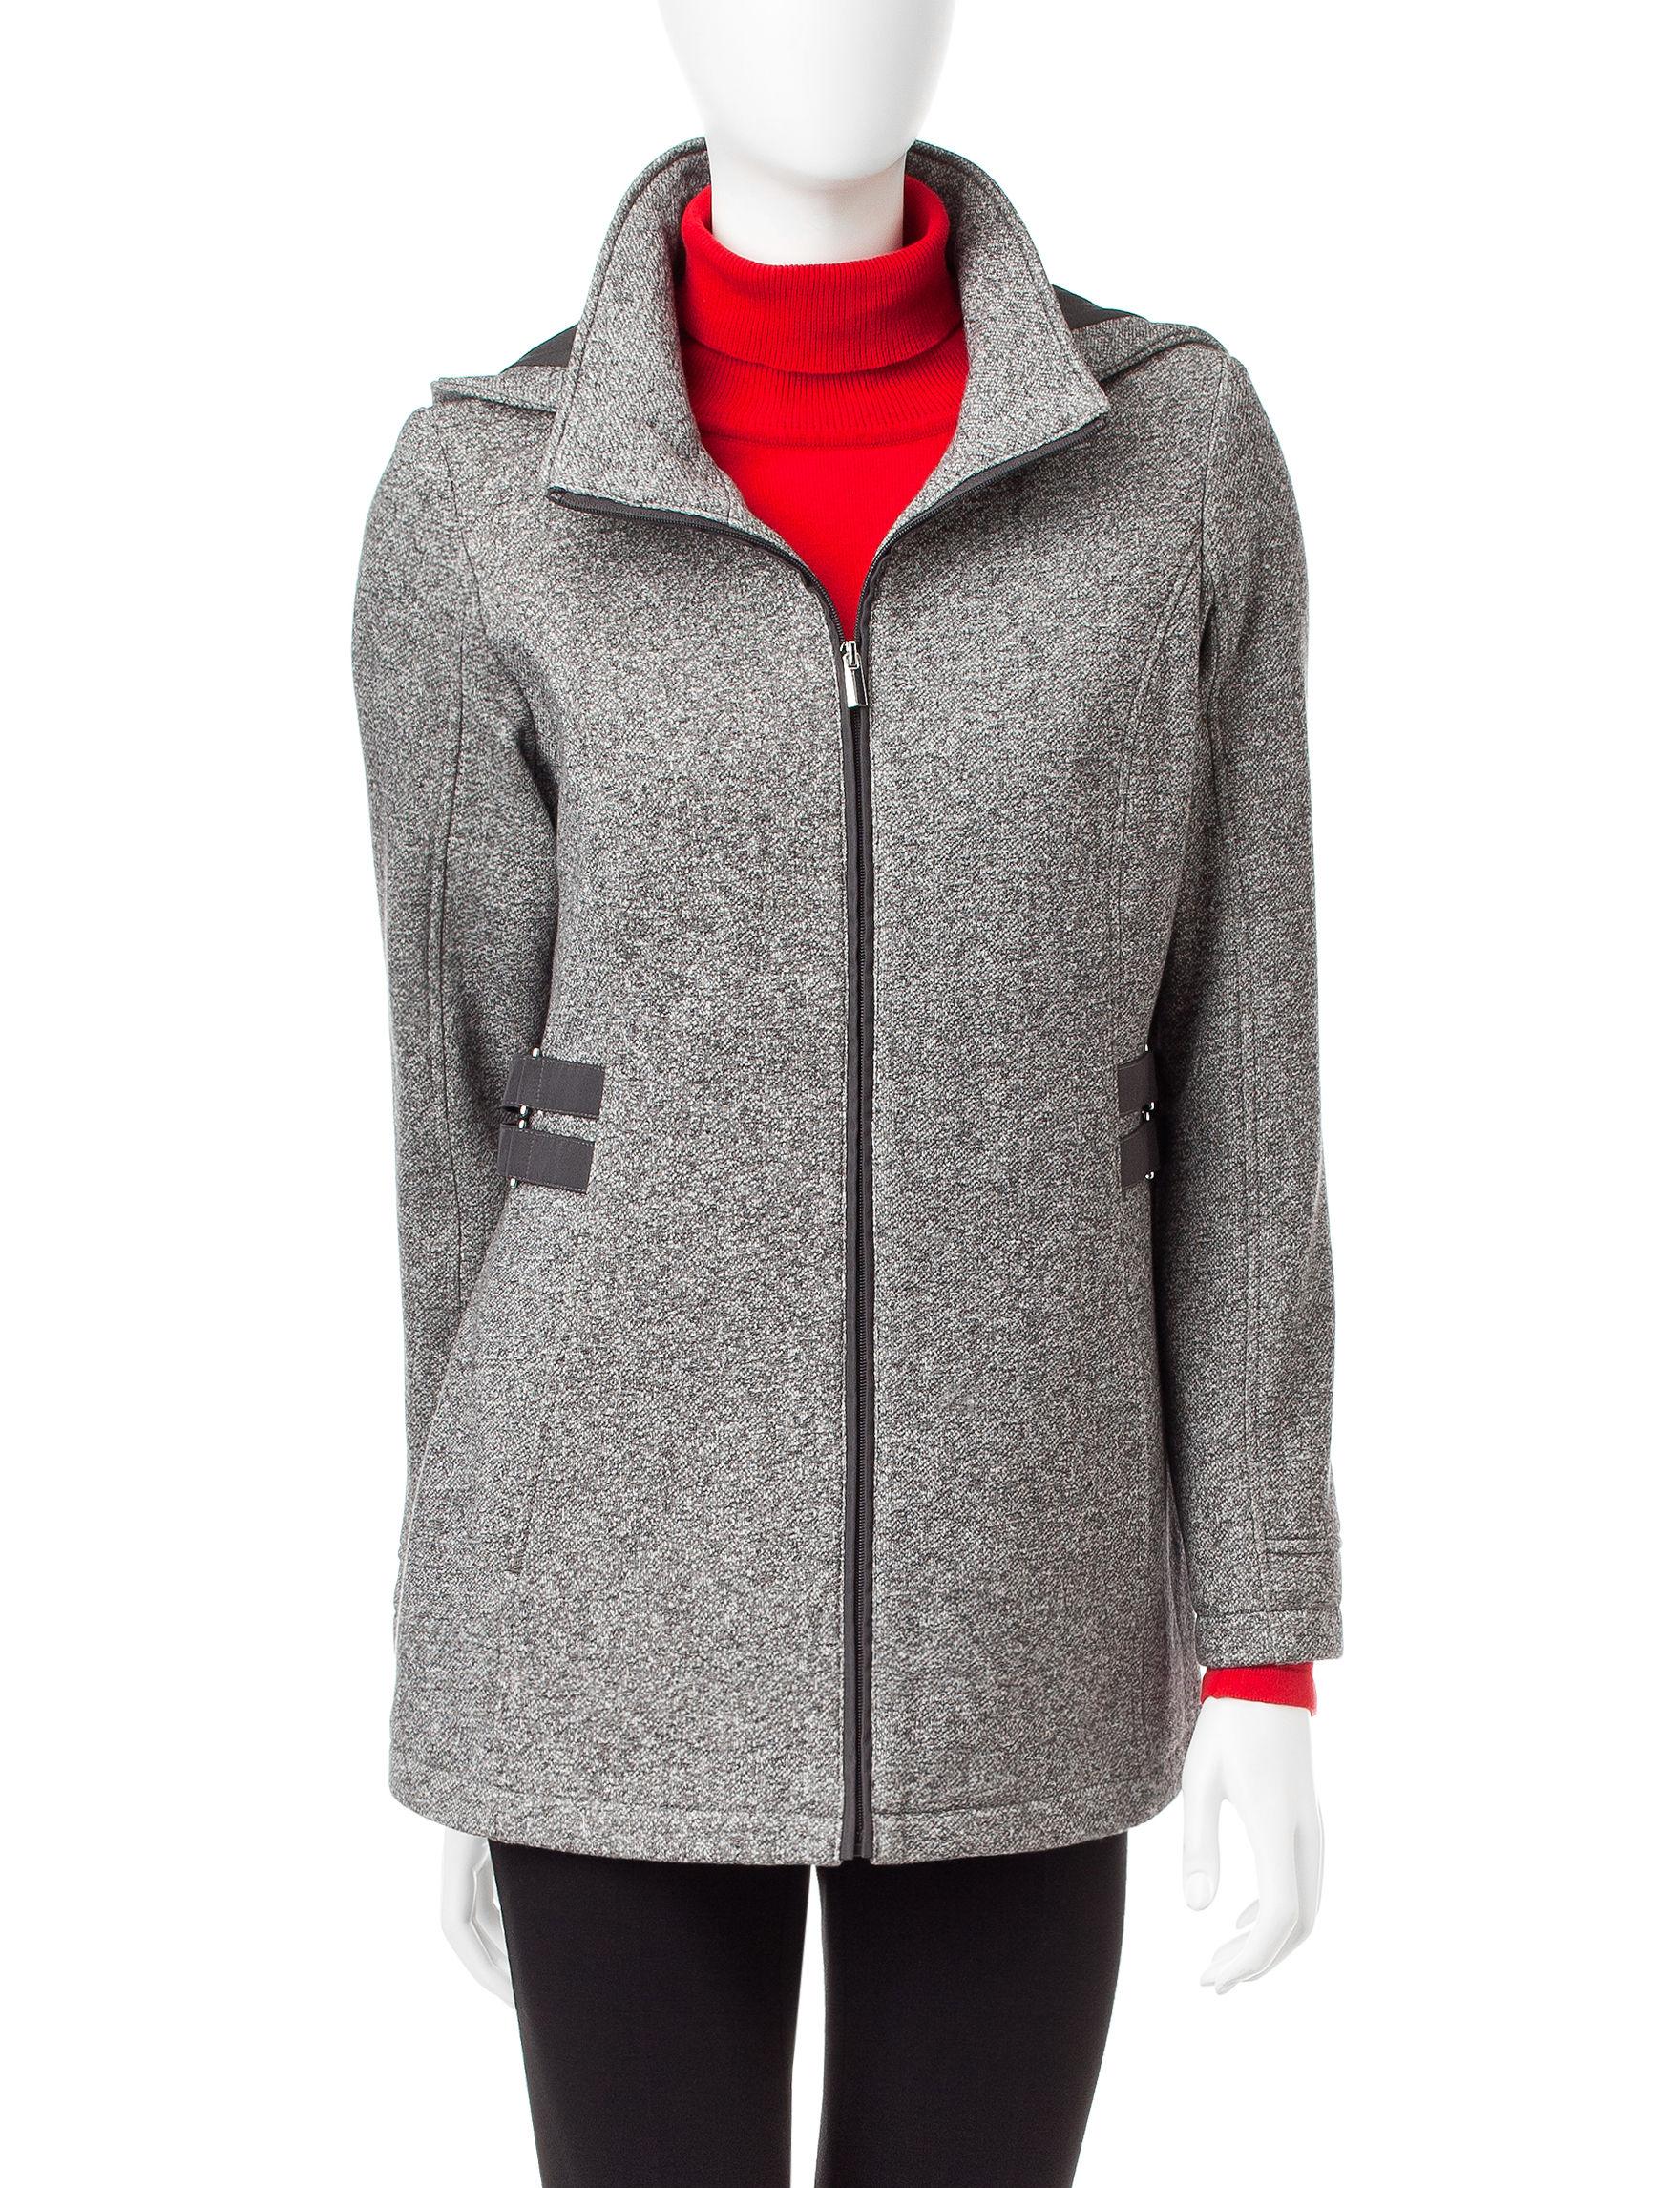 Details Grey Peacoats & Overcoats